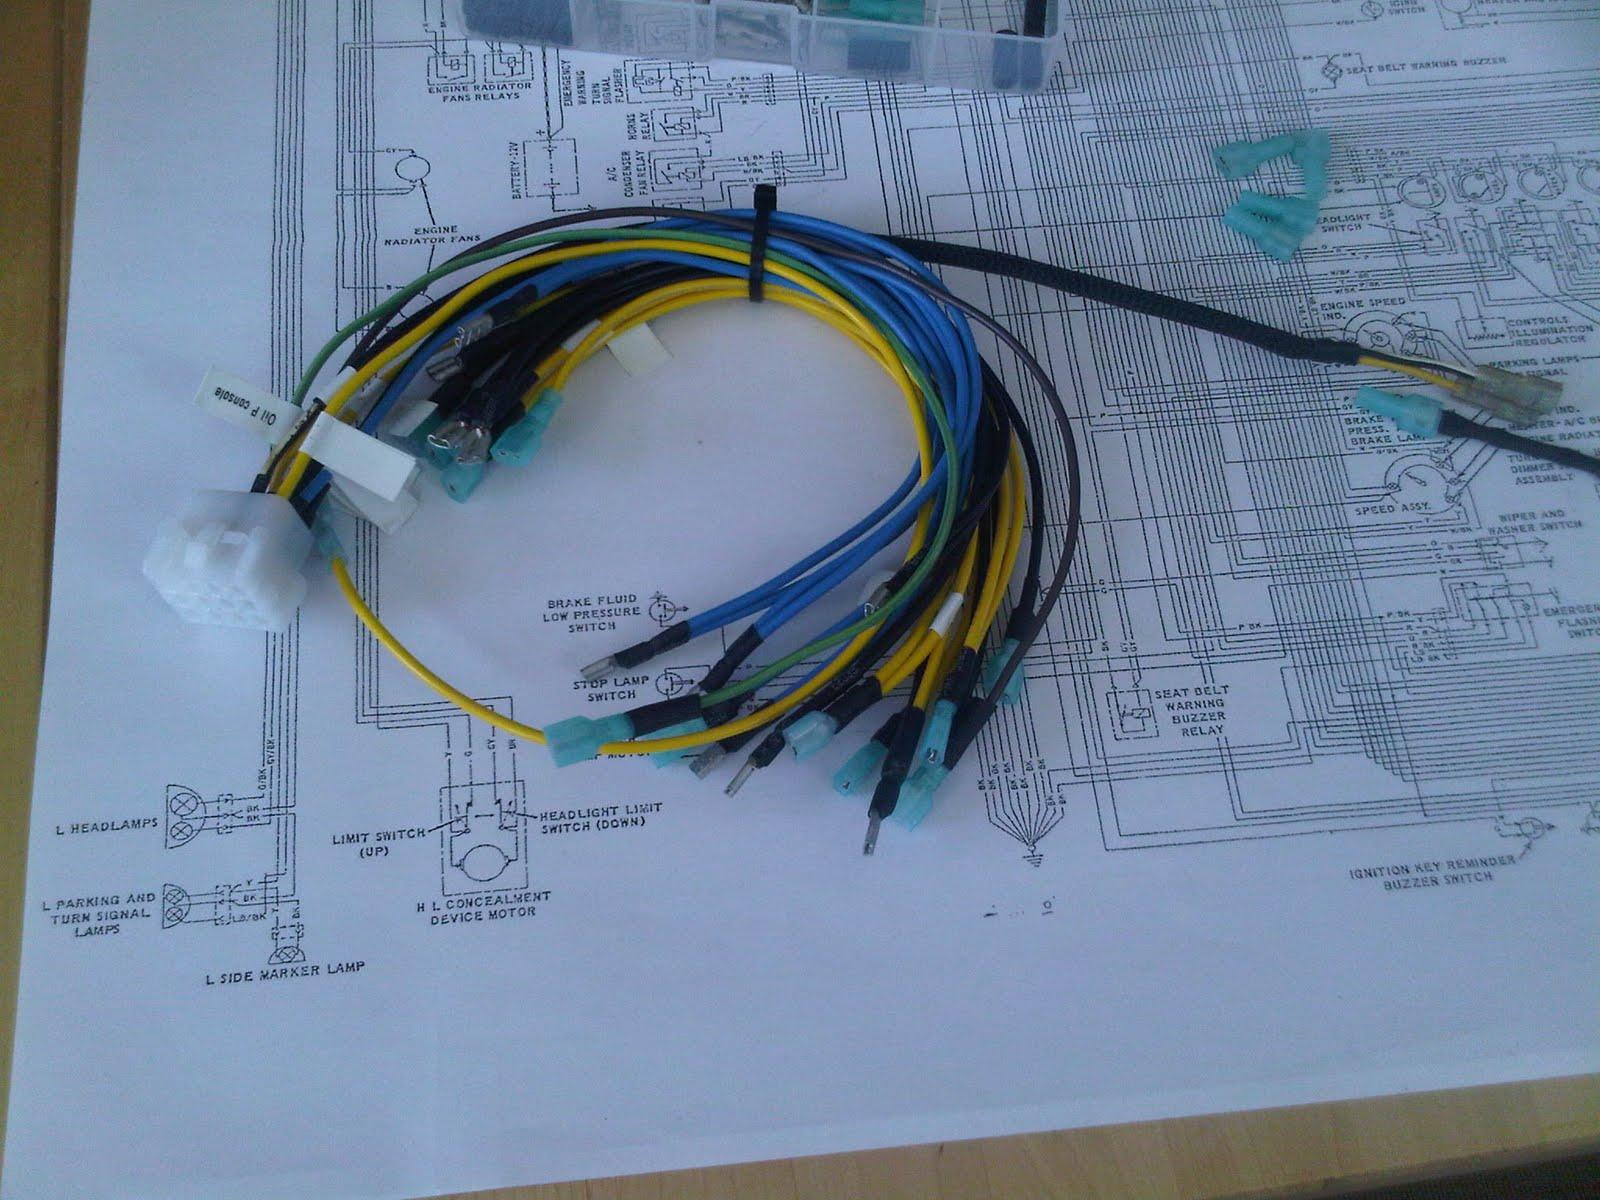 hight resolution of 1998 ski doo wiring diagram online